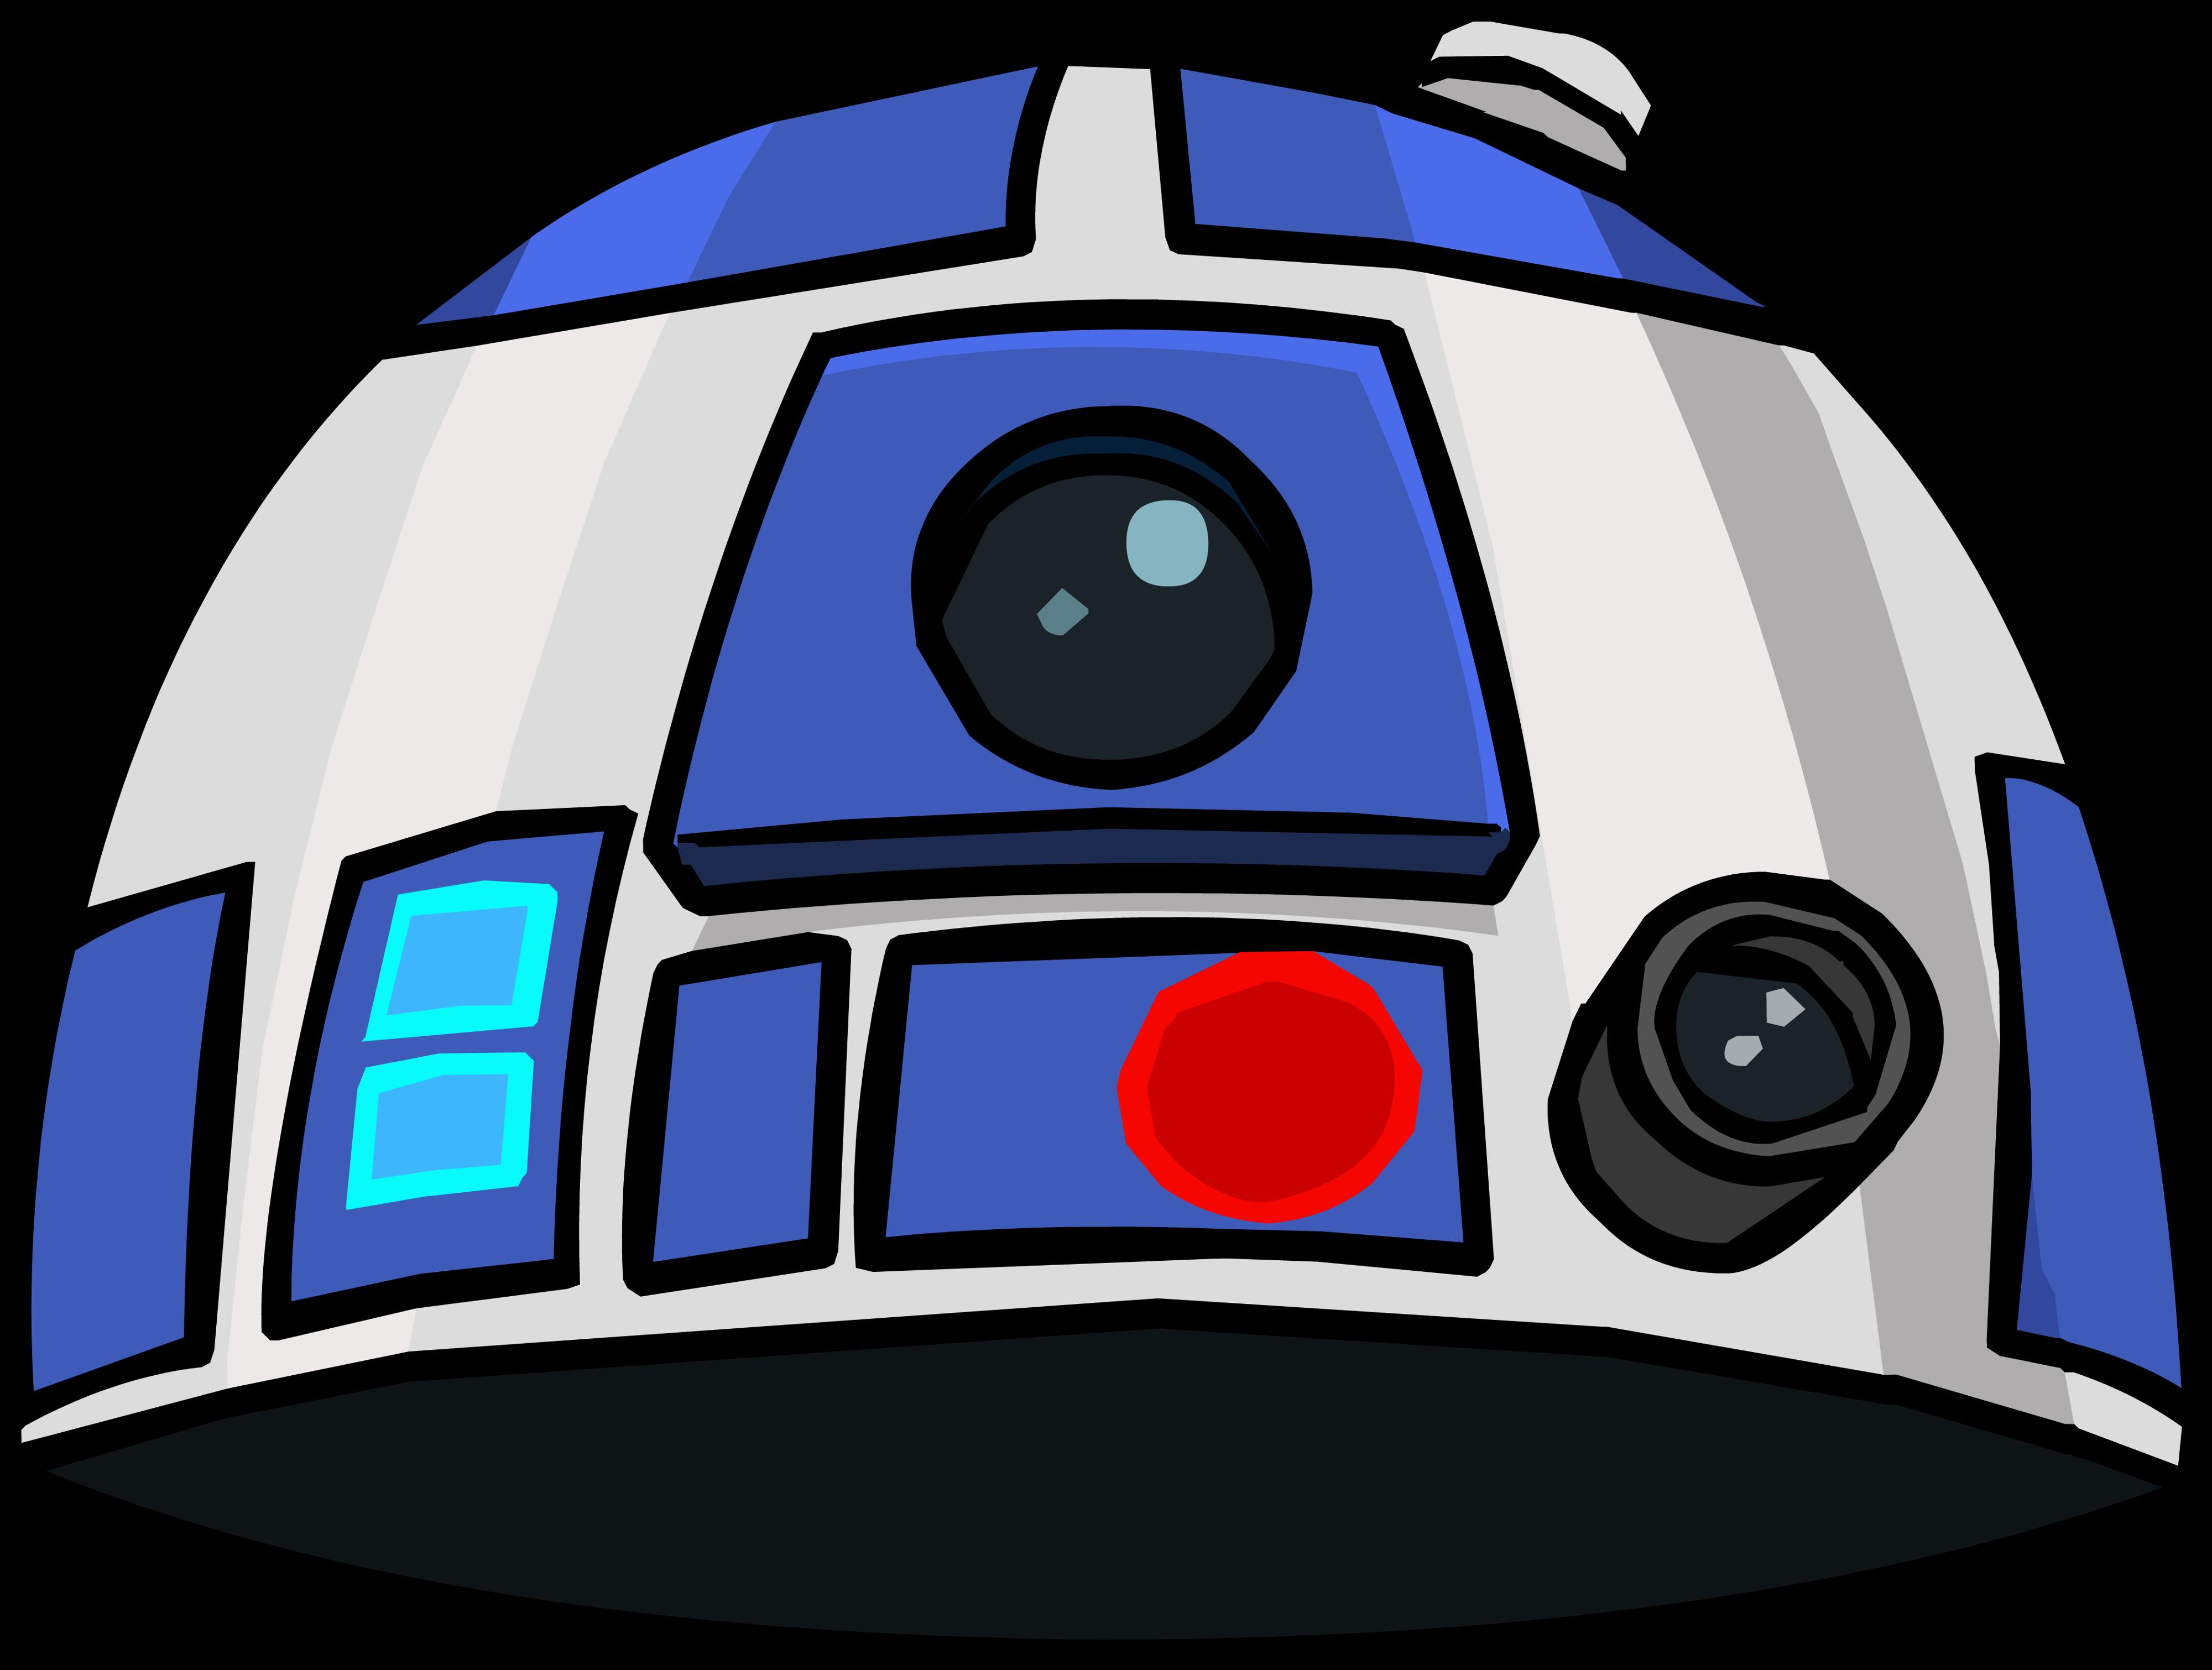 R2d2 Information